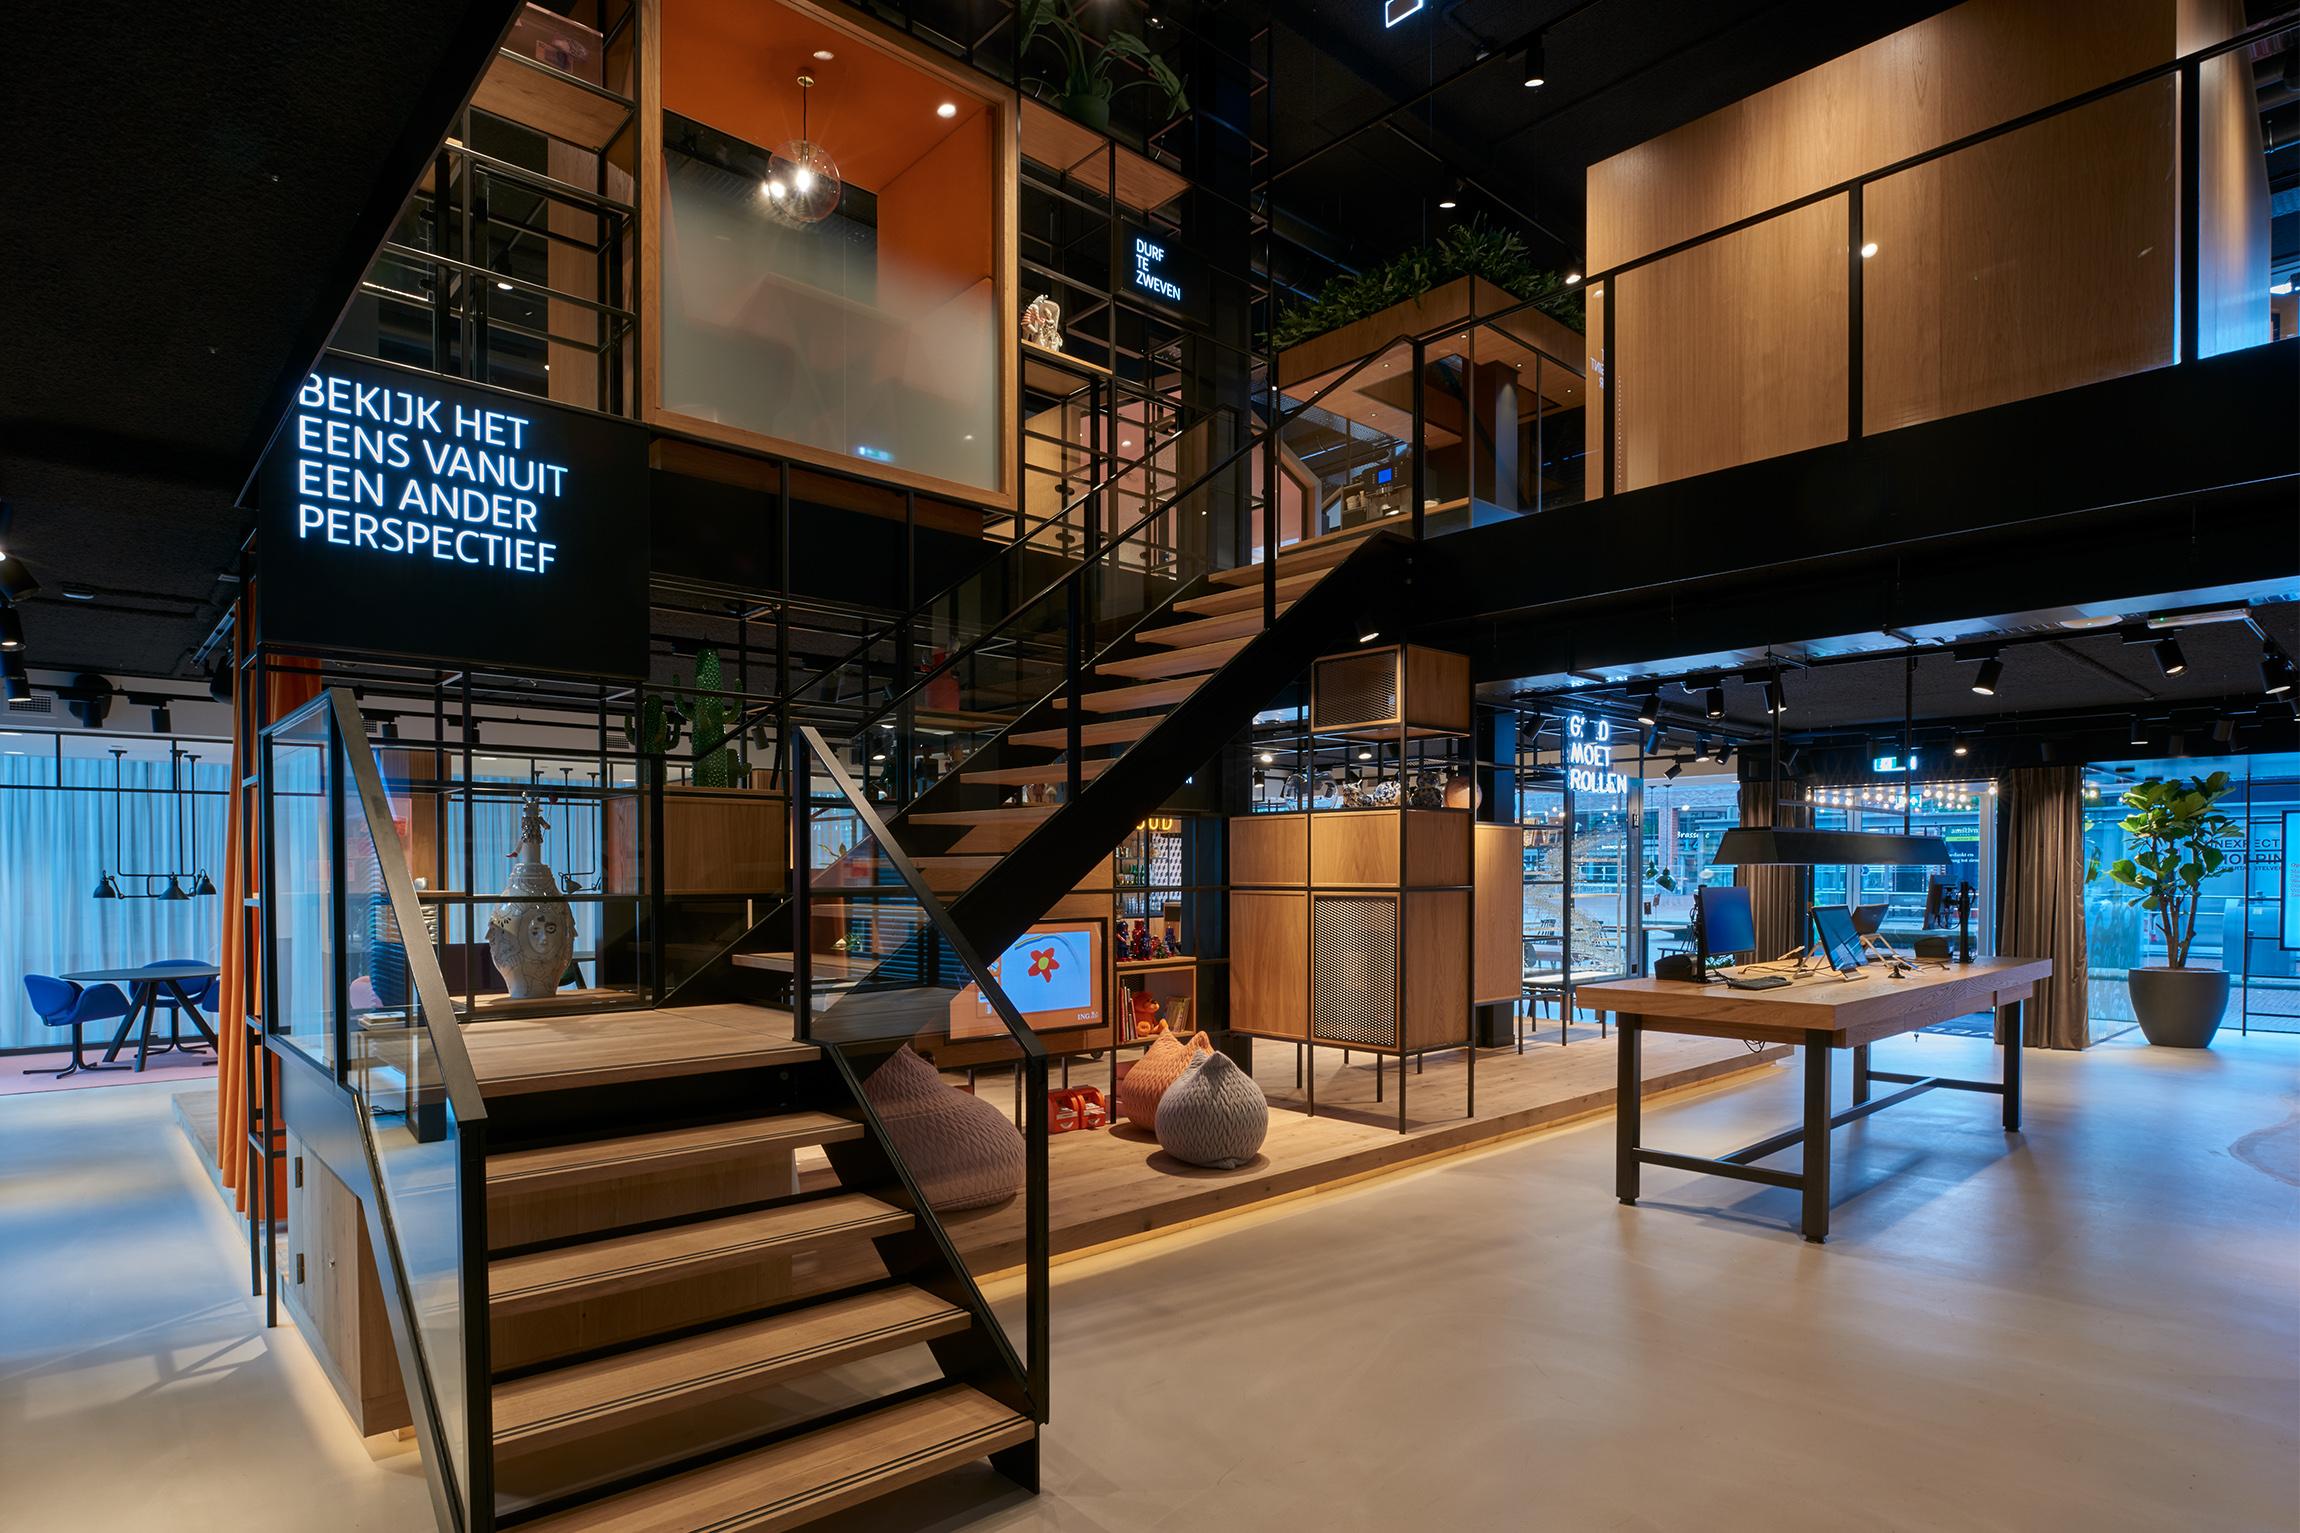 Creneau Interior Design Agency Dubai Middle East ING Bank Central Staircase